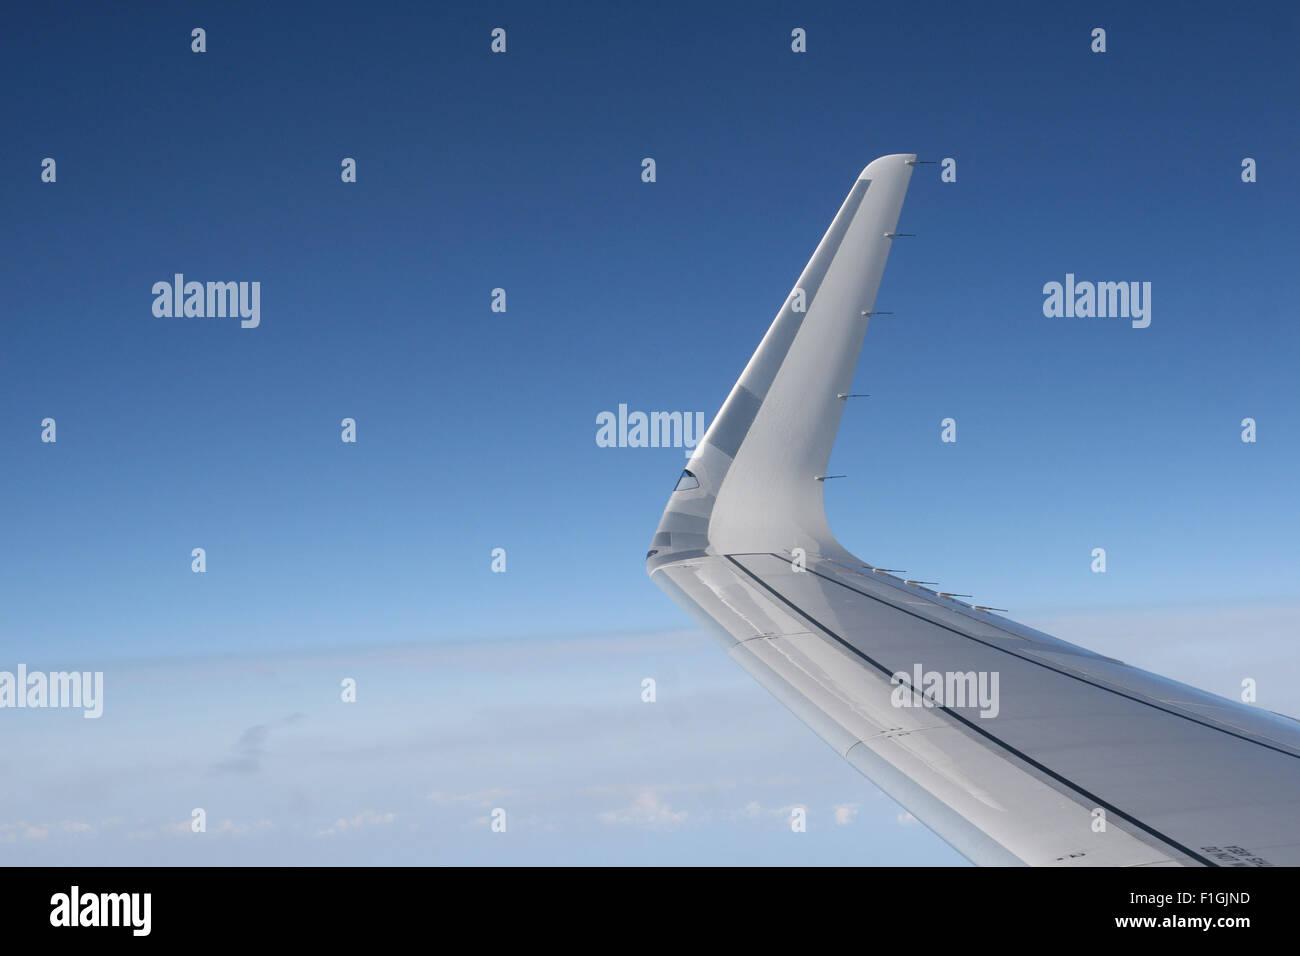 BRITISH AIRWAYS IN FLIGHT WINGLET FLYING - Stock Image